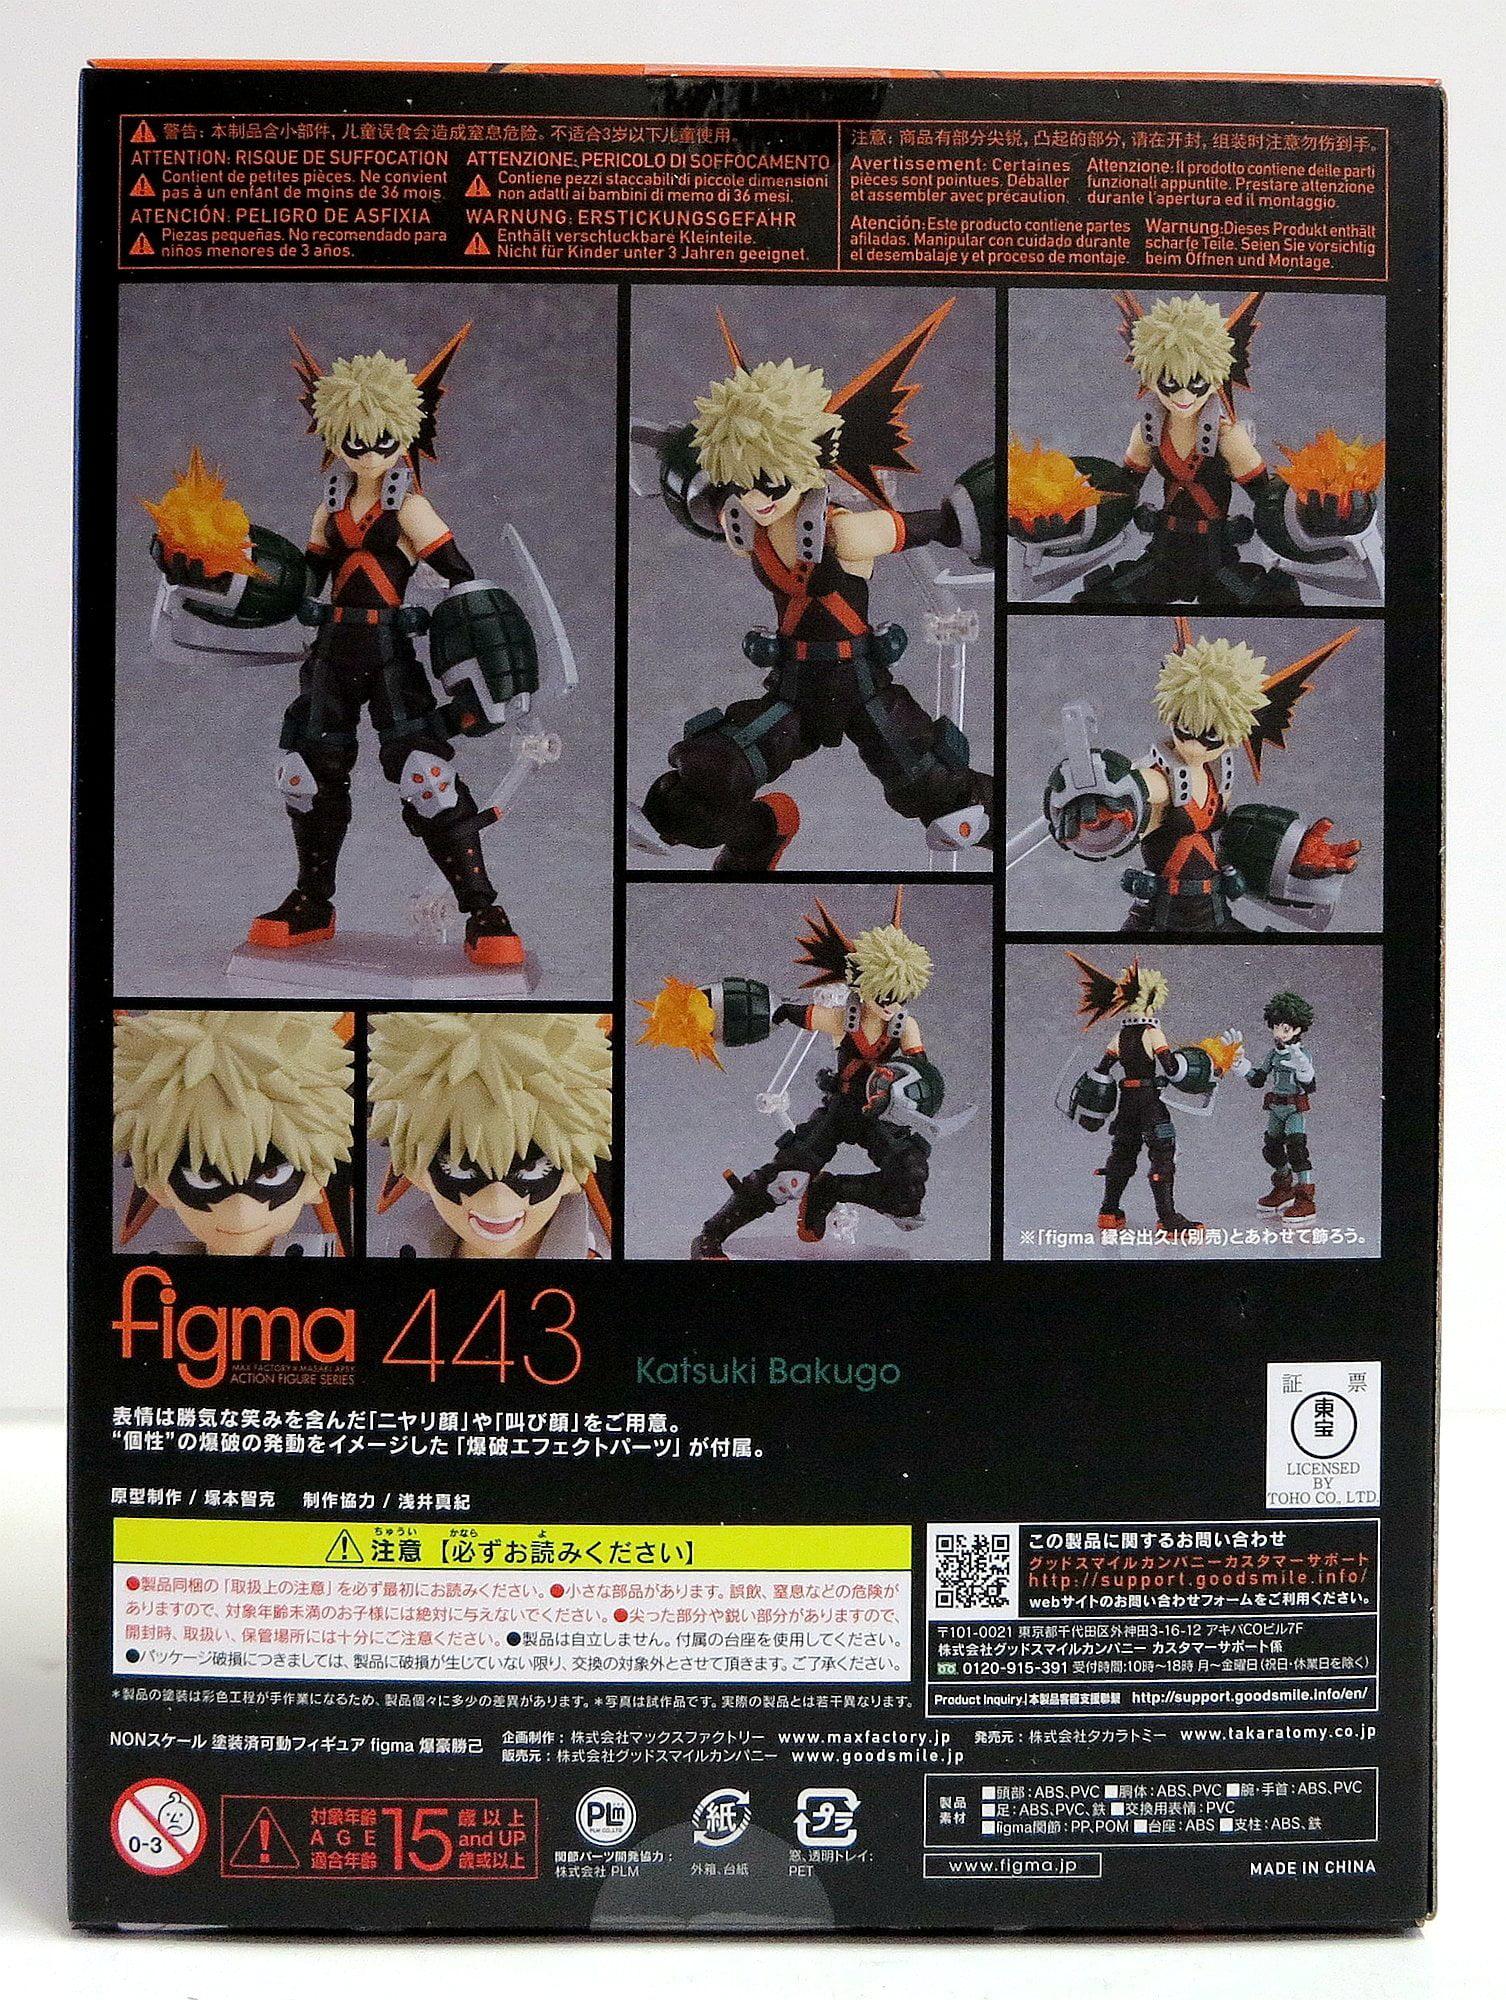 Max Factory figma 443 My Hero Academia Katsuki Bakugo action figure